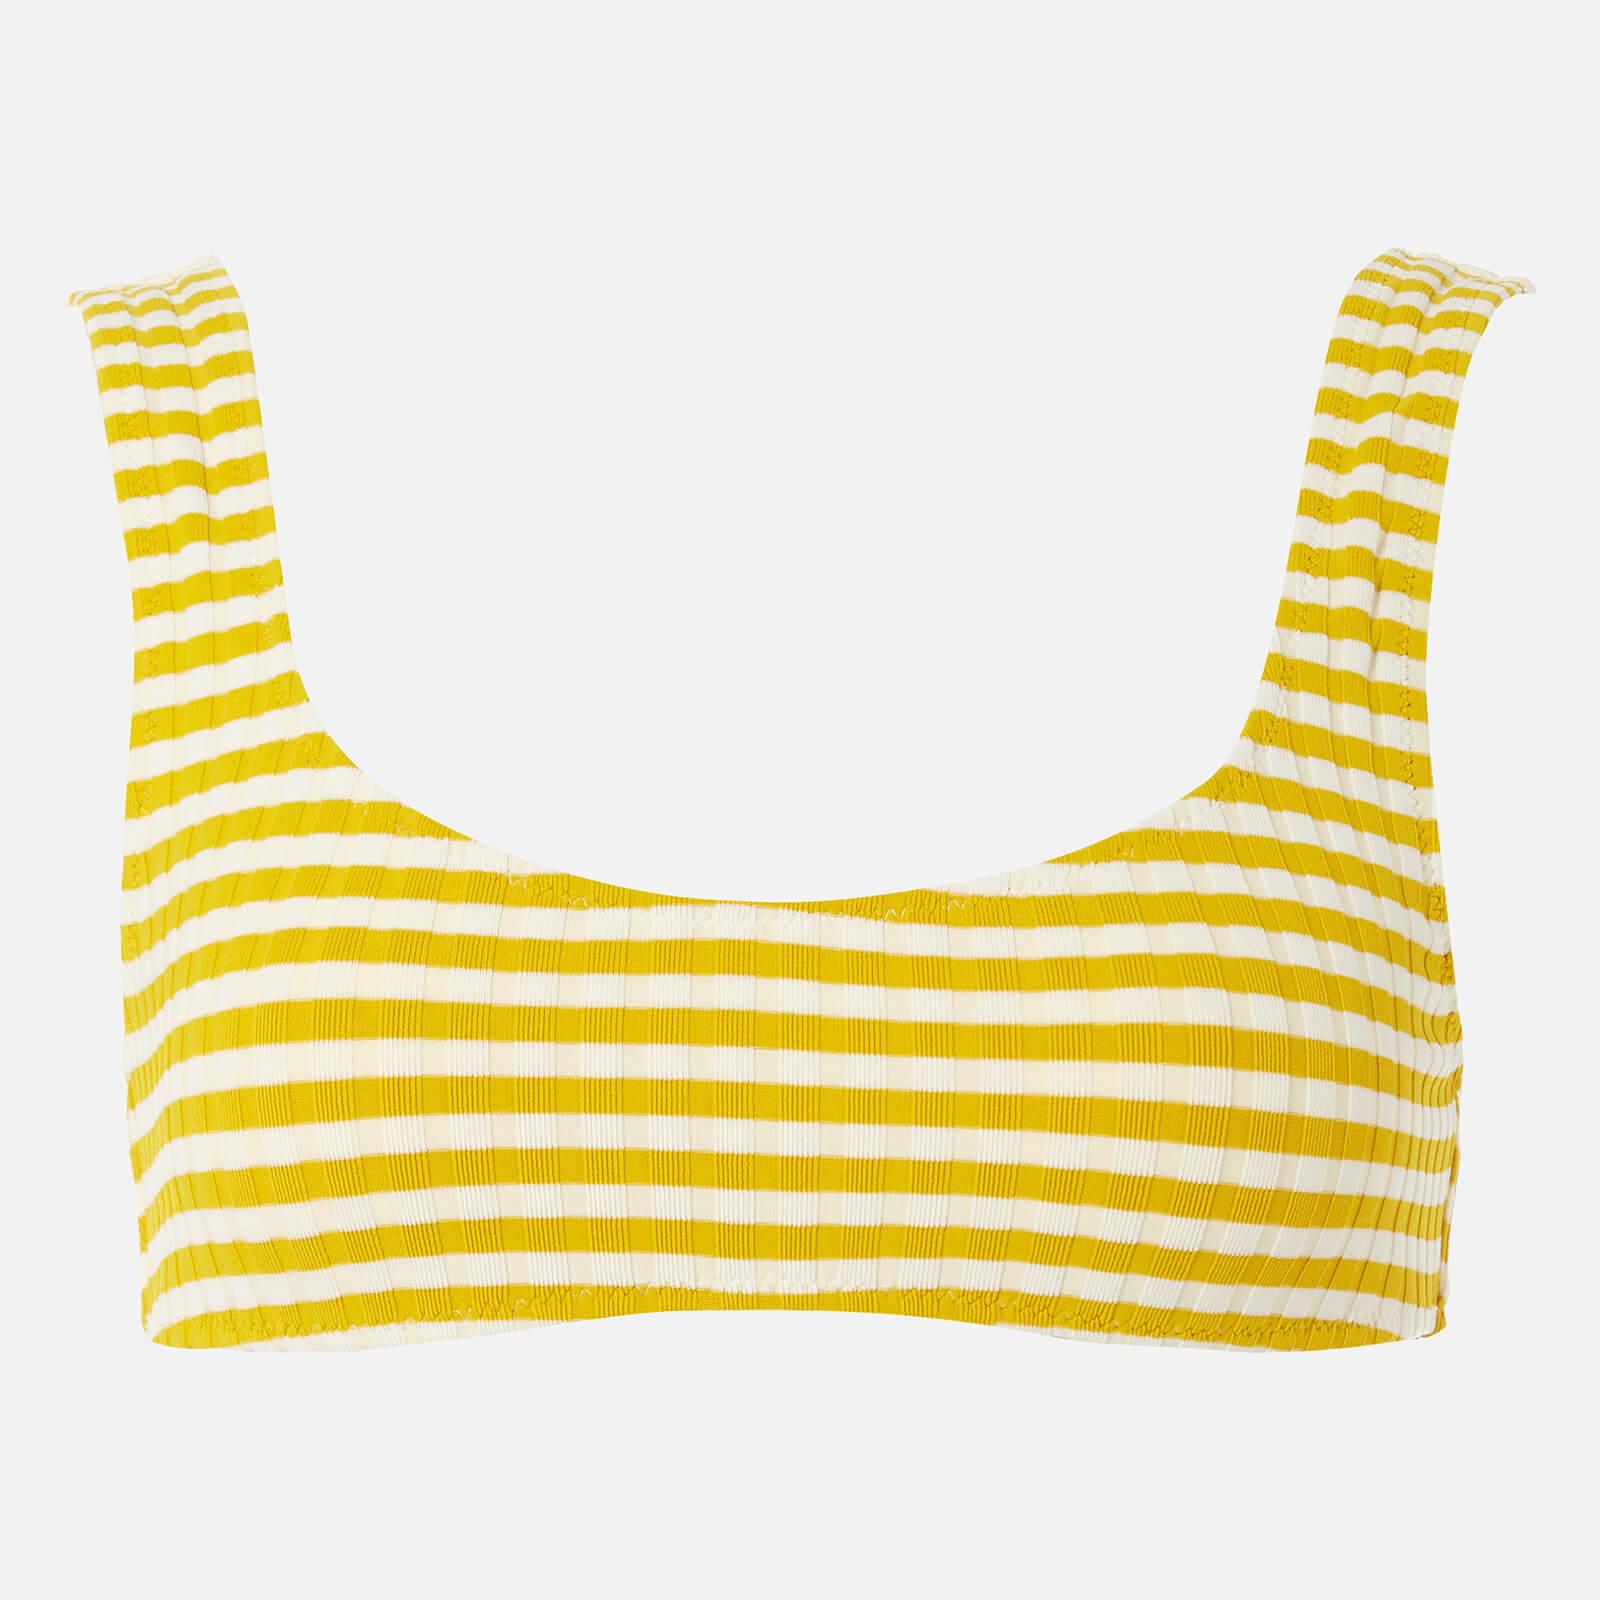 f2e5cba2ab4d Solid   Striped Women s The Elle Top - Mustard Stripe Rib - Free UK  Delivery over £50